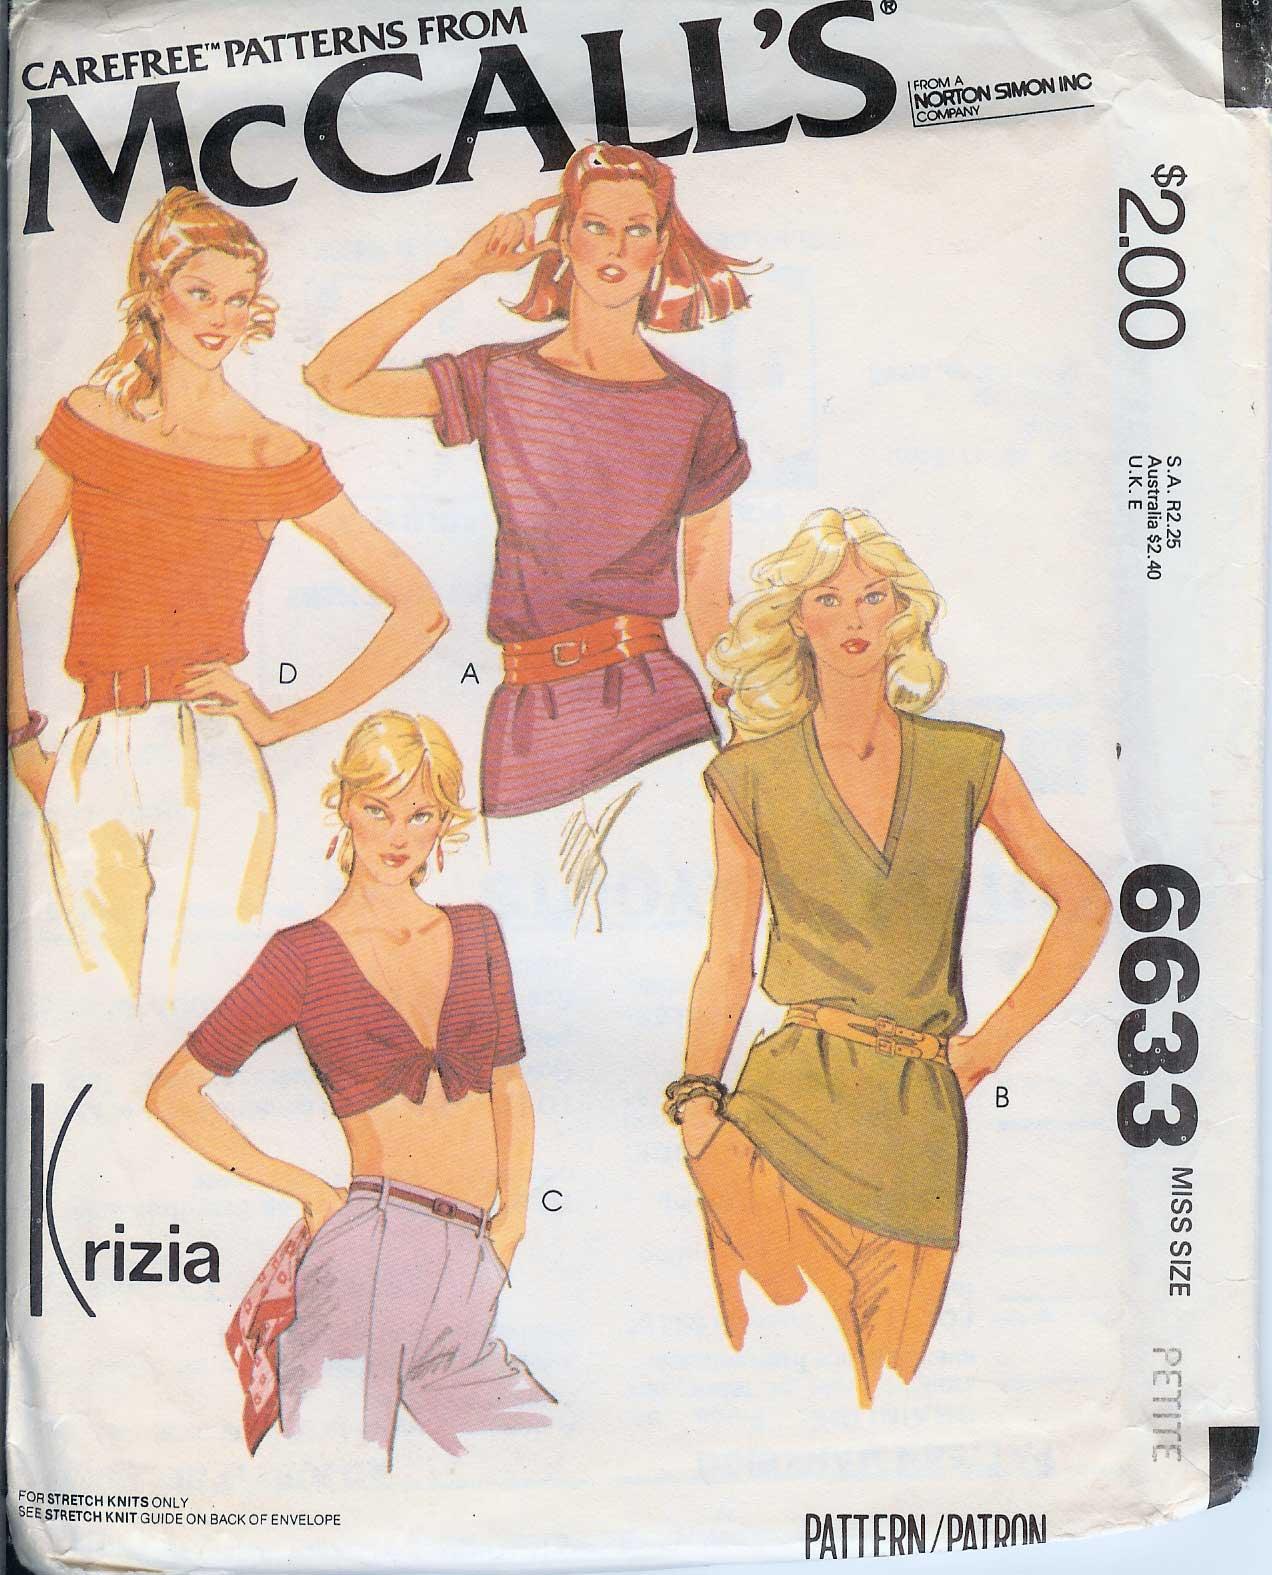 McCall's 6633